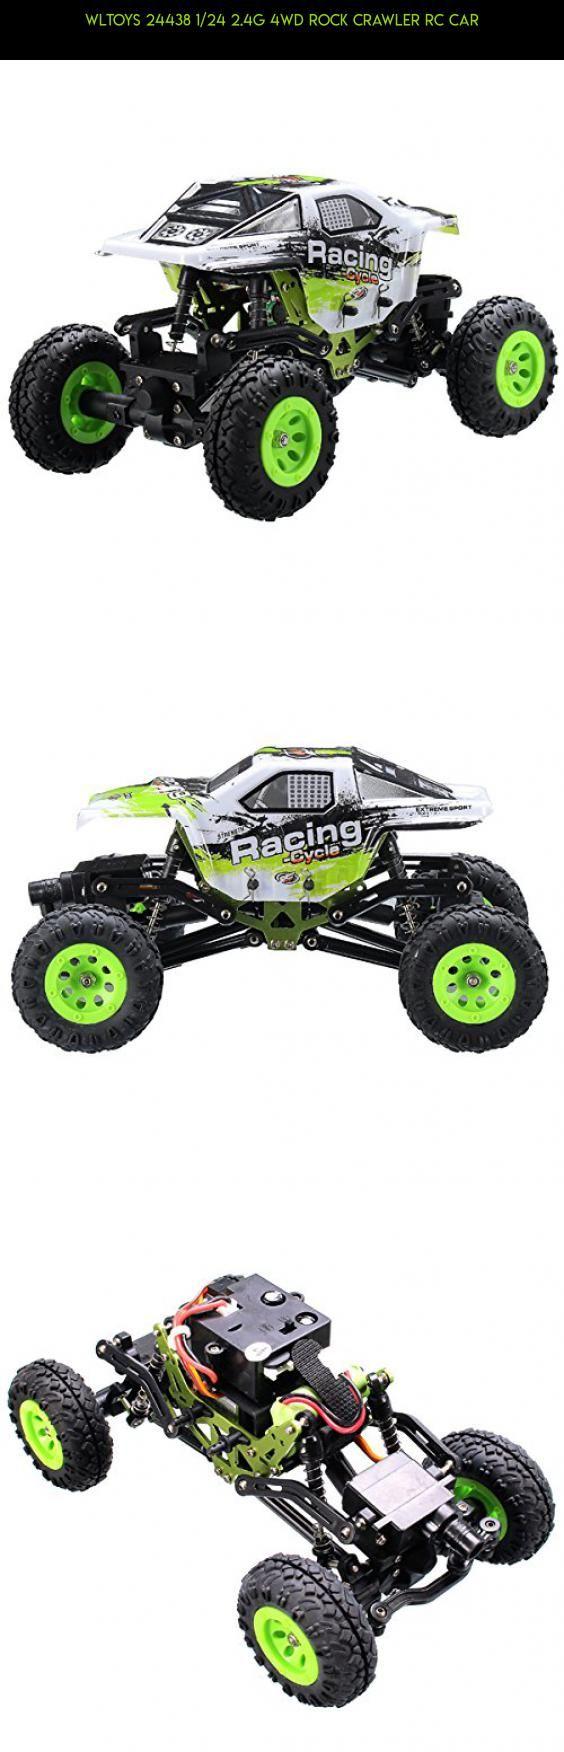 Wltoys 24438 1 24 2 4g 4wd rock crawler rc car parts fpv